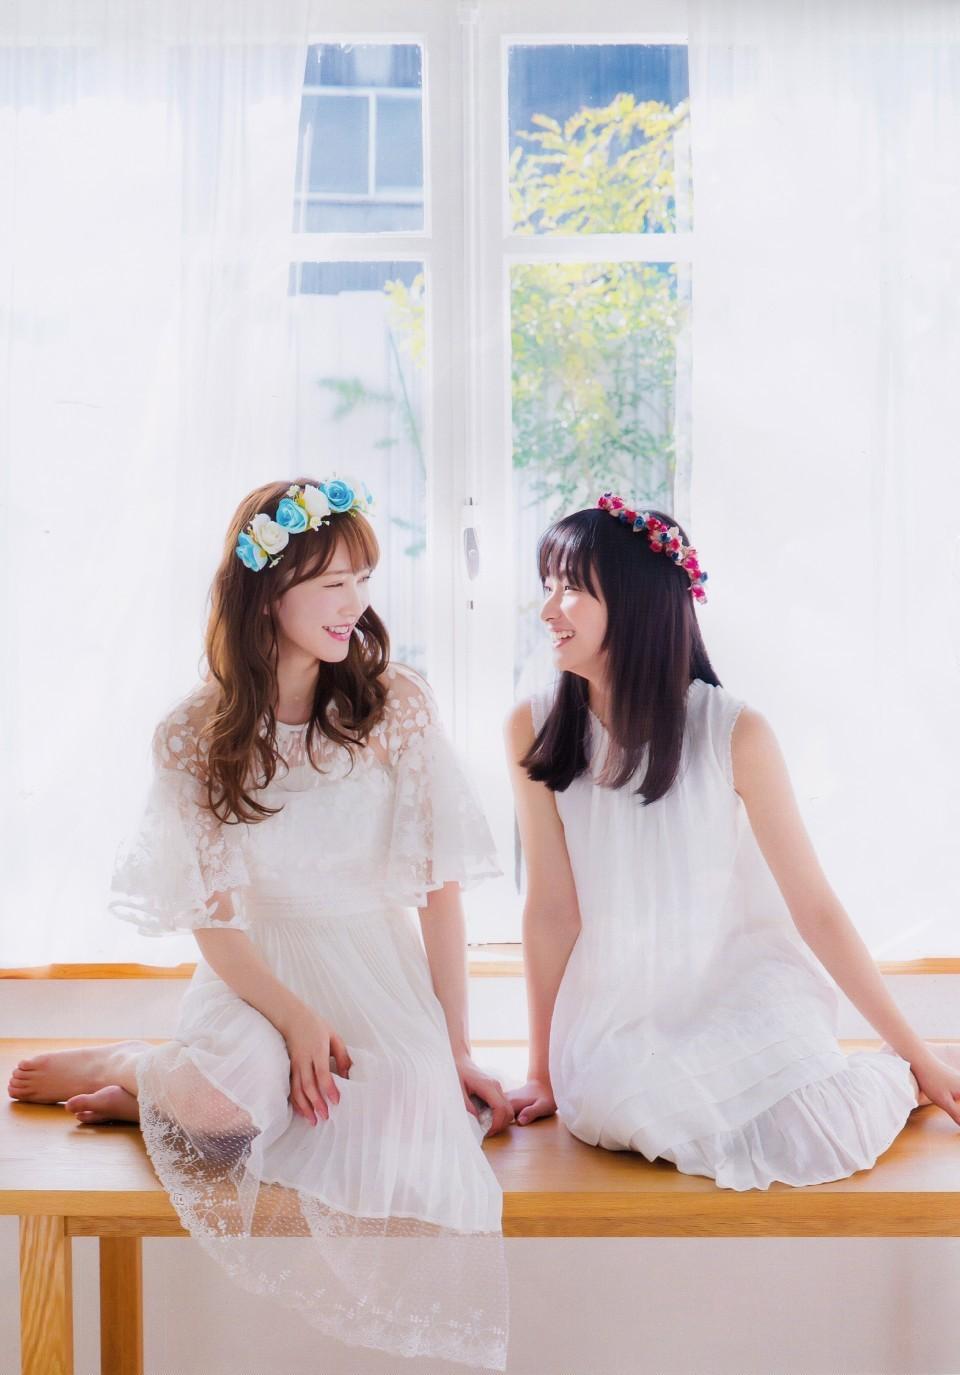 Kato Shiho 加藤史帆, Kageyama Yuuka 影山優佳, GIRLS PLUS 2018 VOL.03